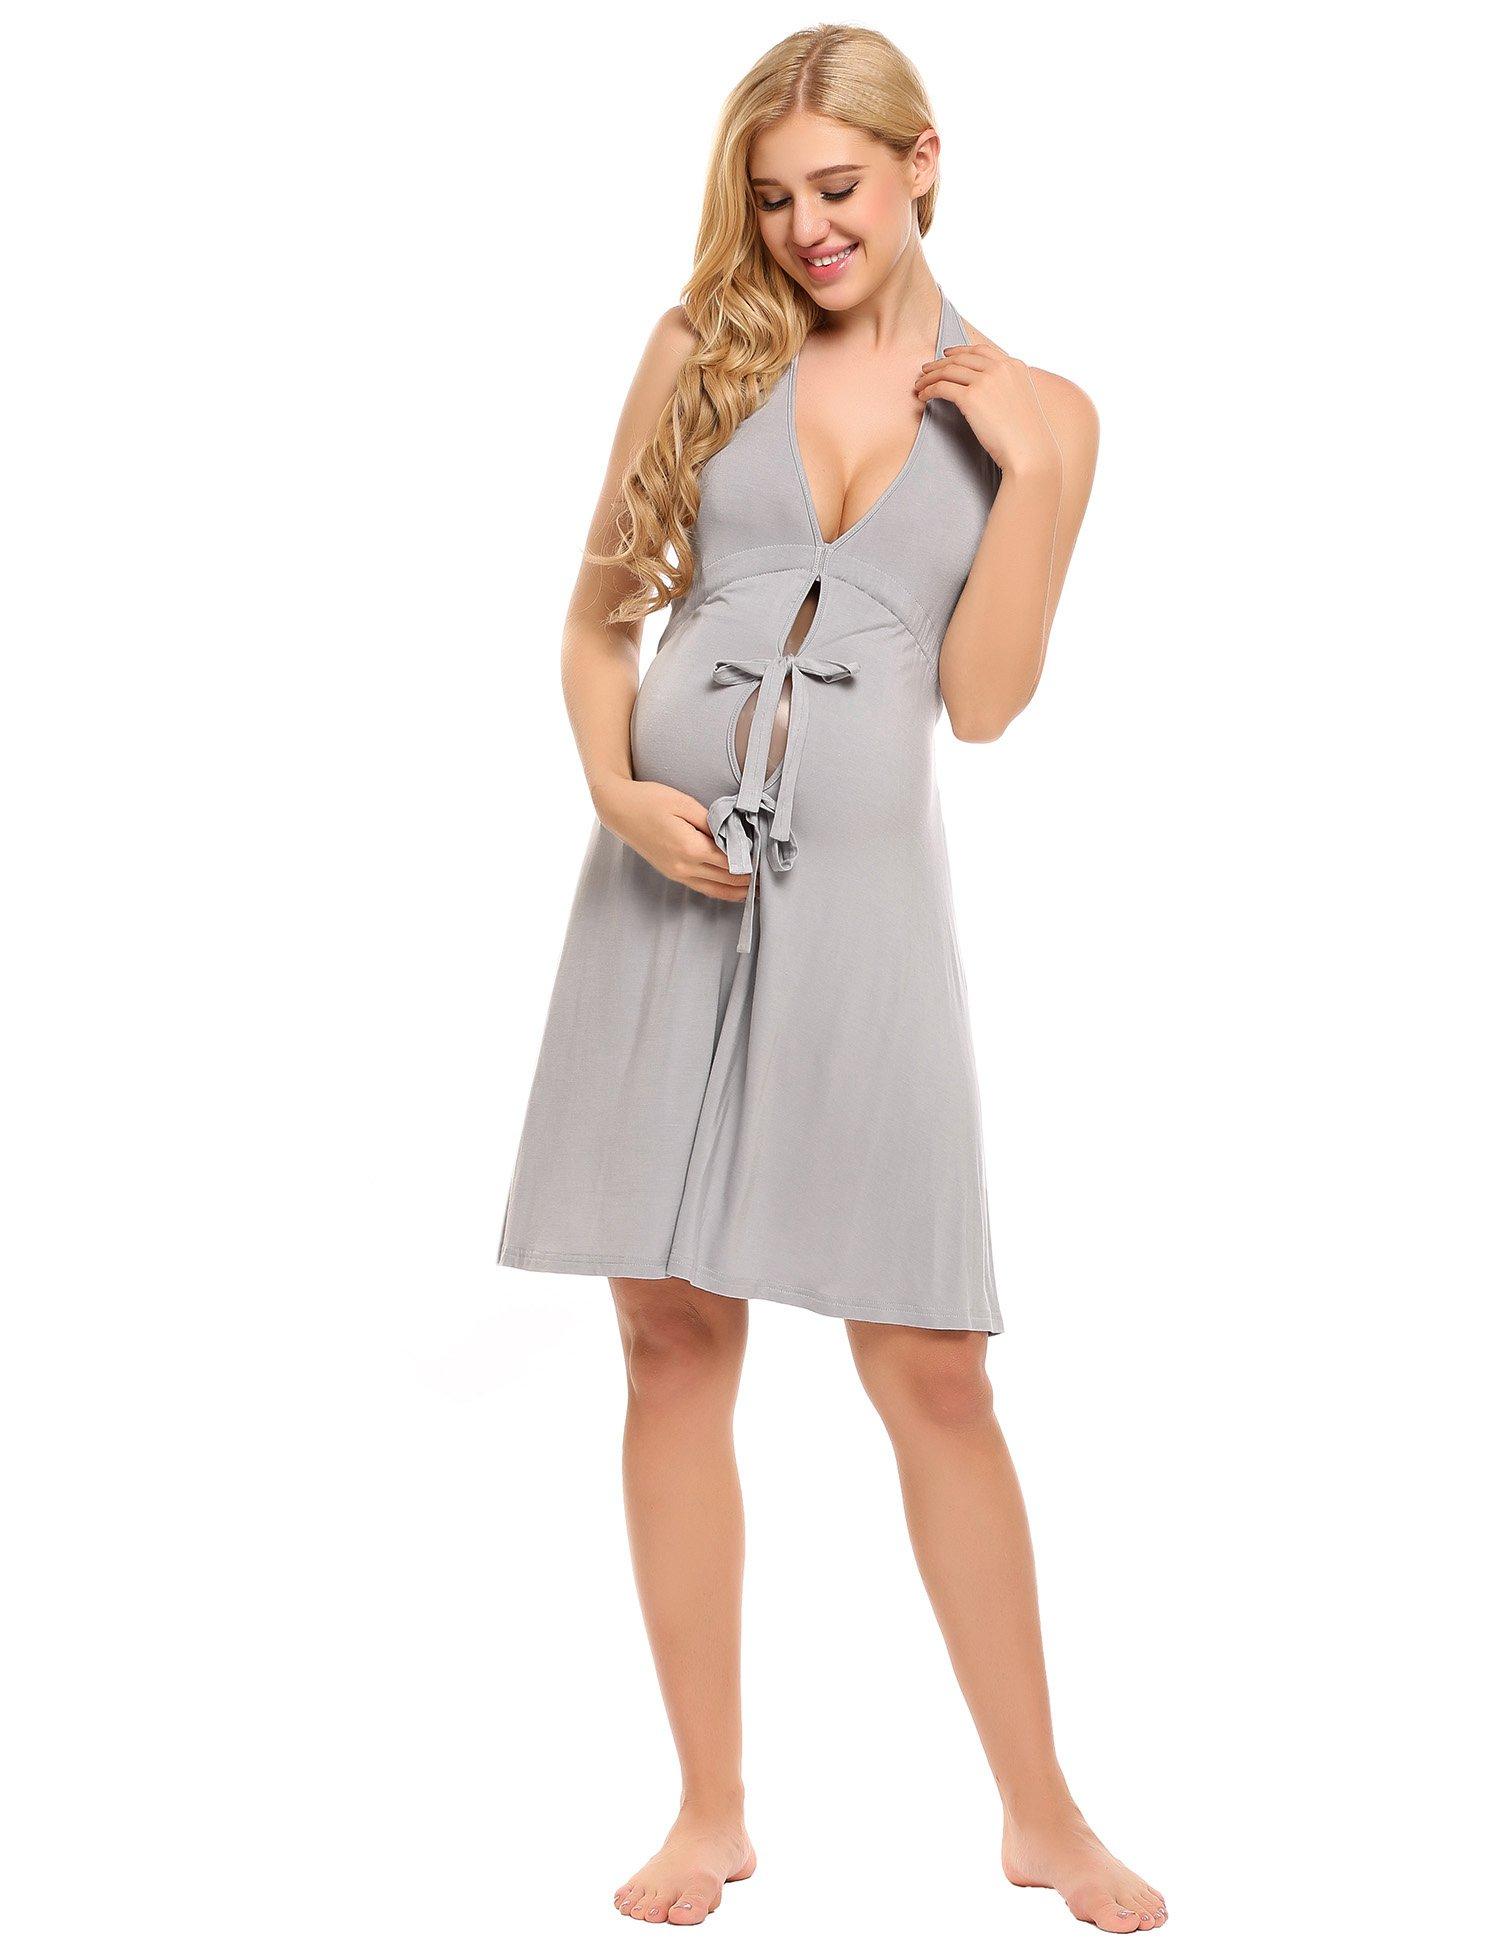 Ekouaer Womens Maternity Nursing Nightgown Dress for Pregnancy/Breastfeeding (Grey-5928) One Size